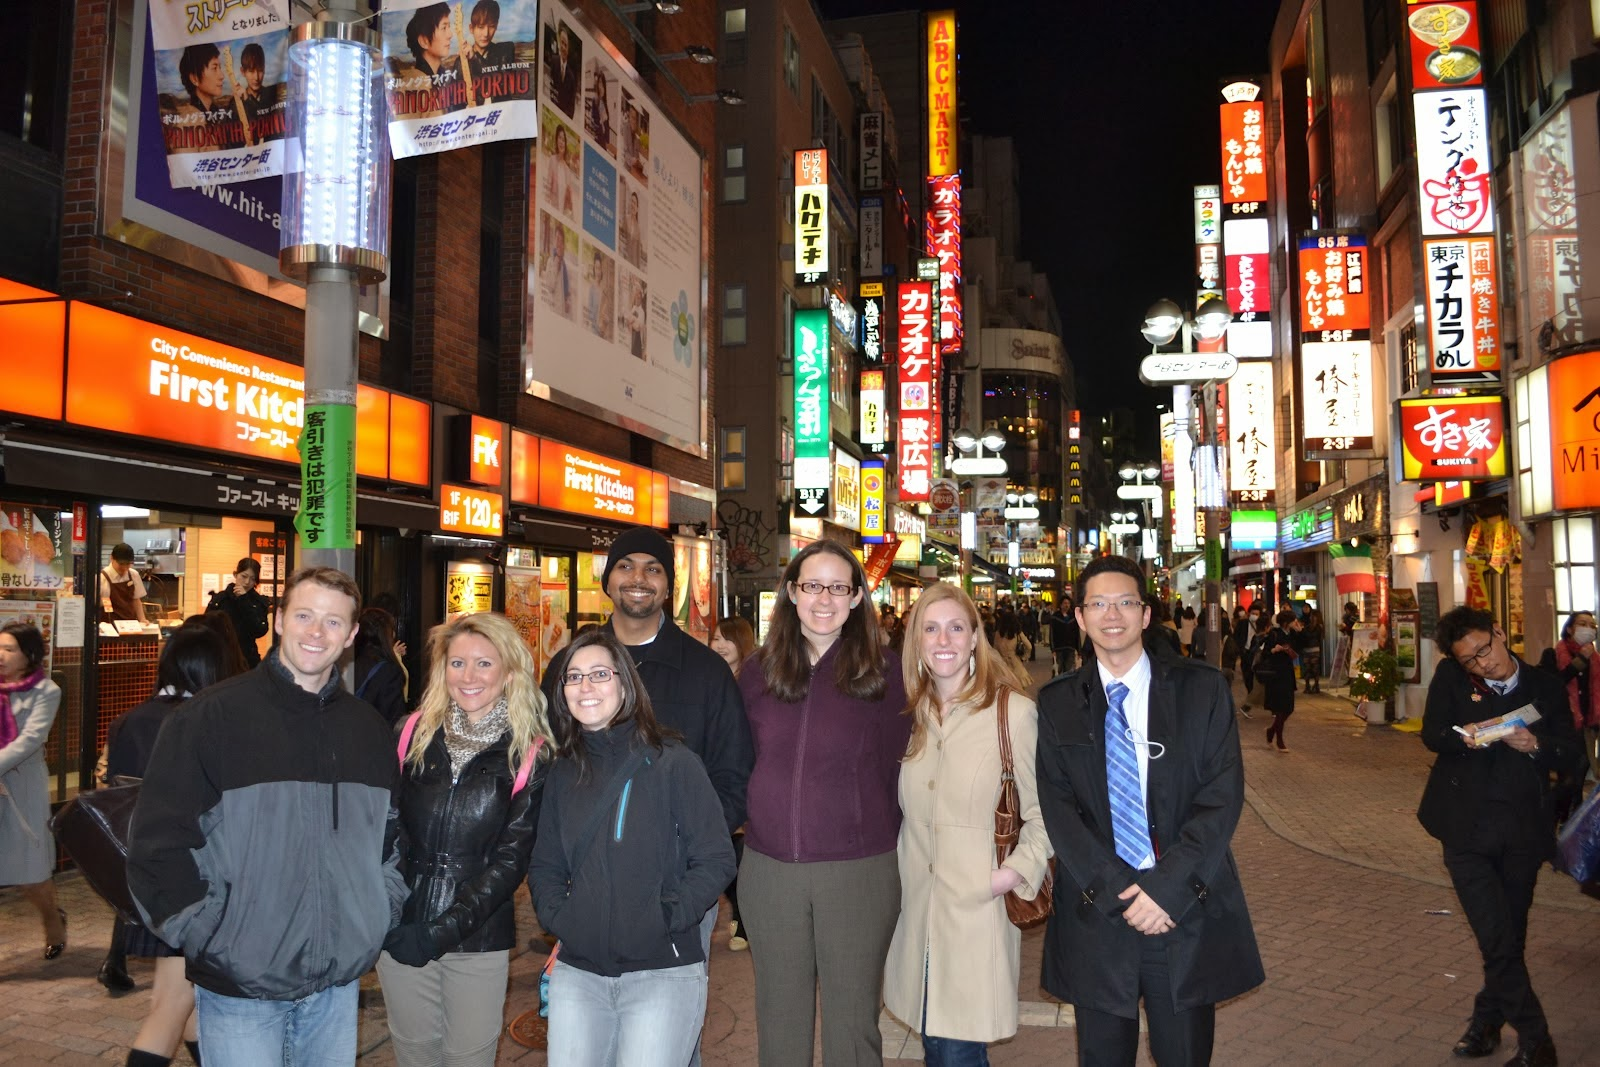 work in Japan, holiday in japan, japanese work ethics, japanese entrepreneur culture, job in Japan, work overseas, start a business, start new business, tokyo, japanese culture, Working Holiday visa